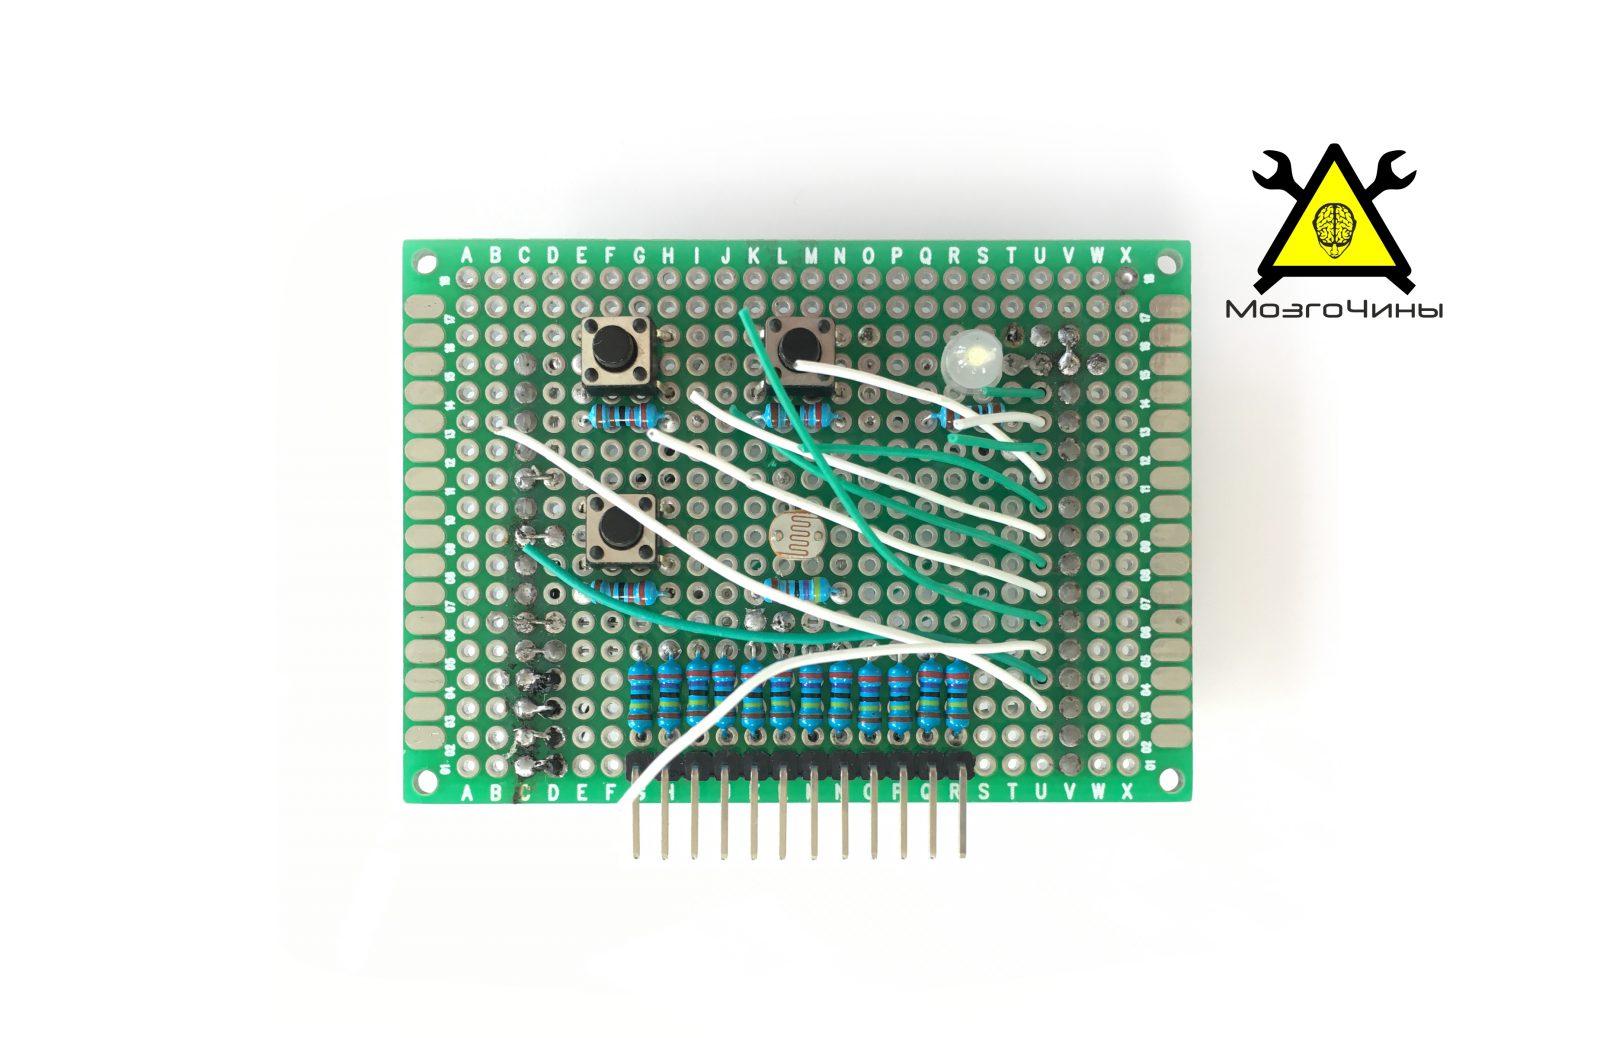 How to make a MIDI Interface - Bare Conductive